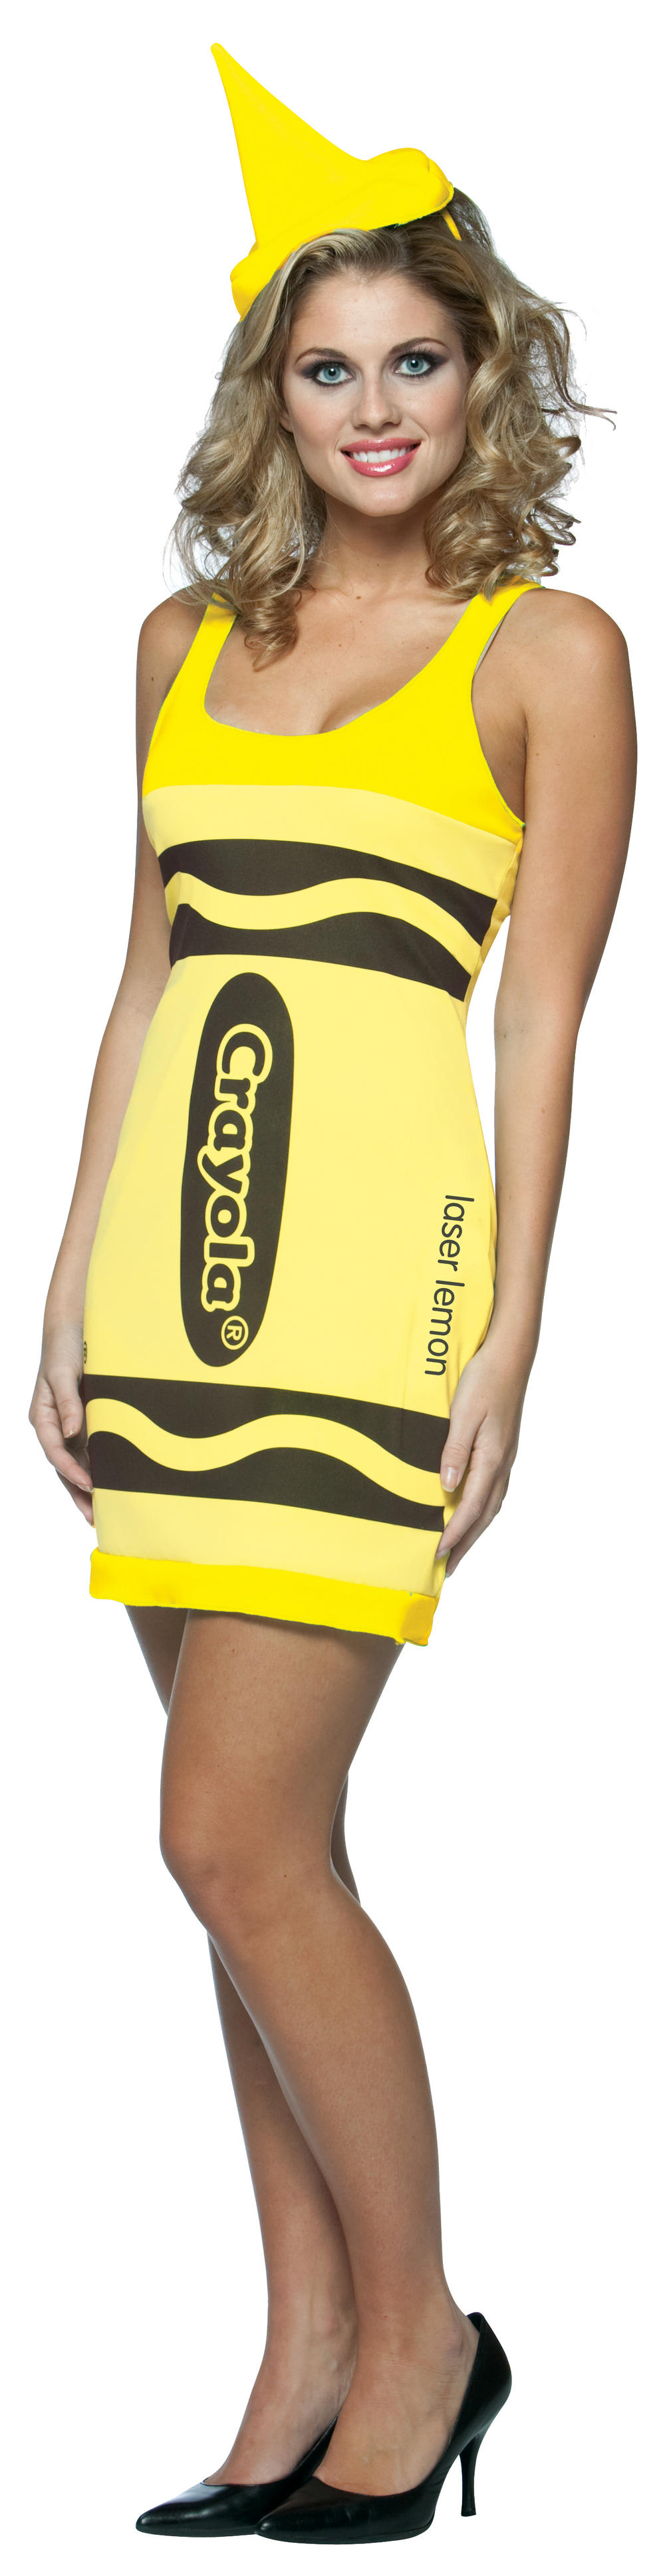 Neon Yellow Crayola Crayon Dress